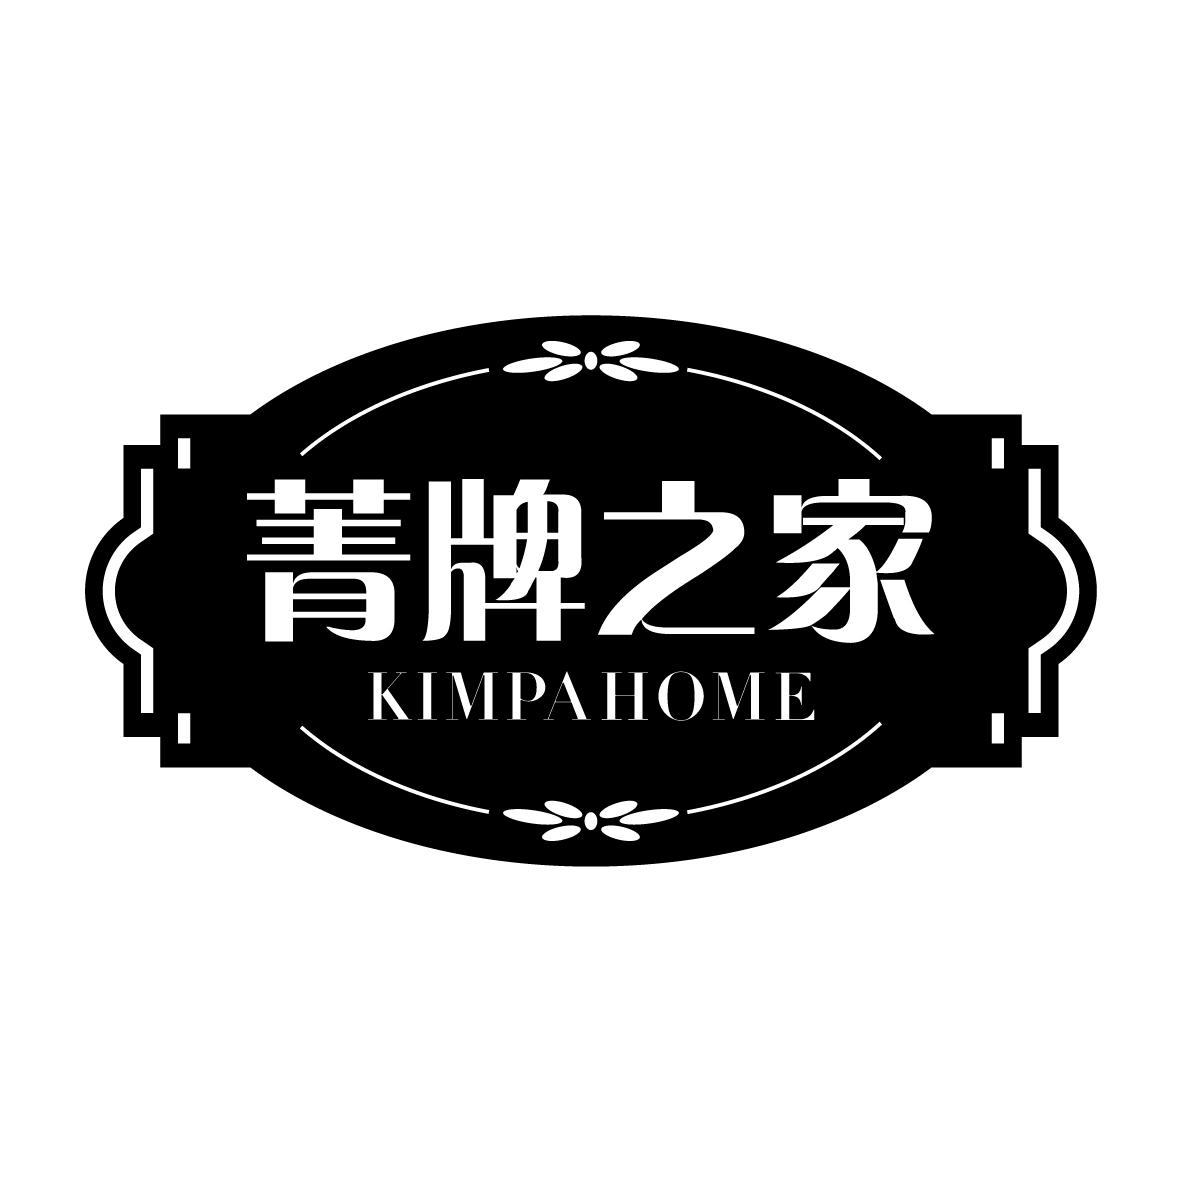 菁牌之家KIMPAHOME